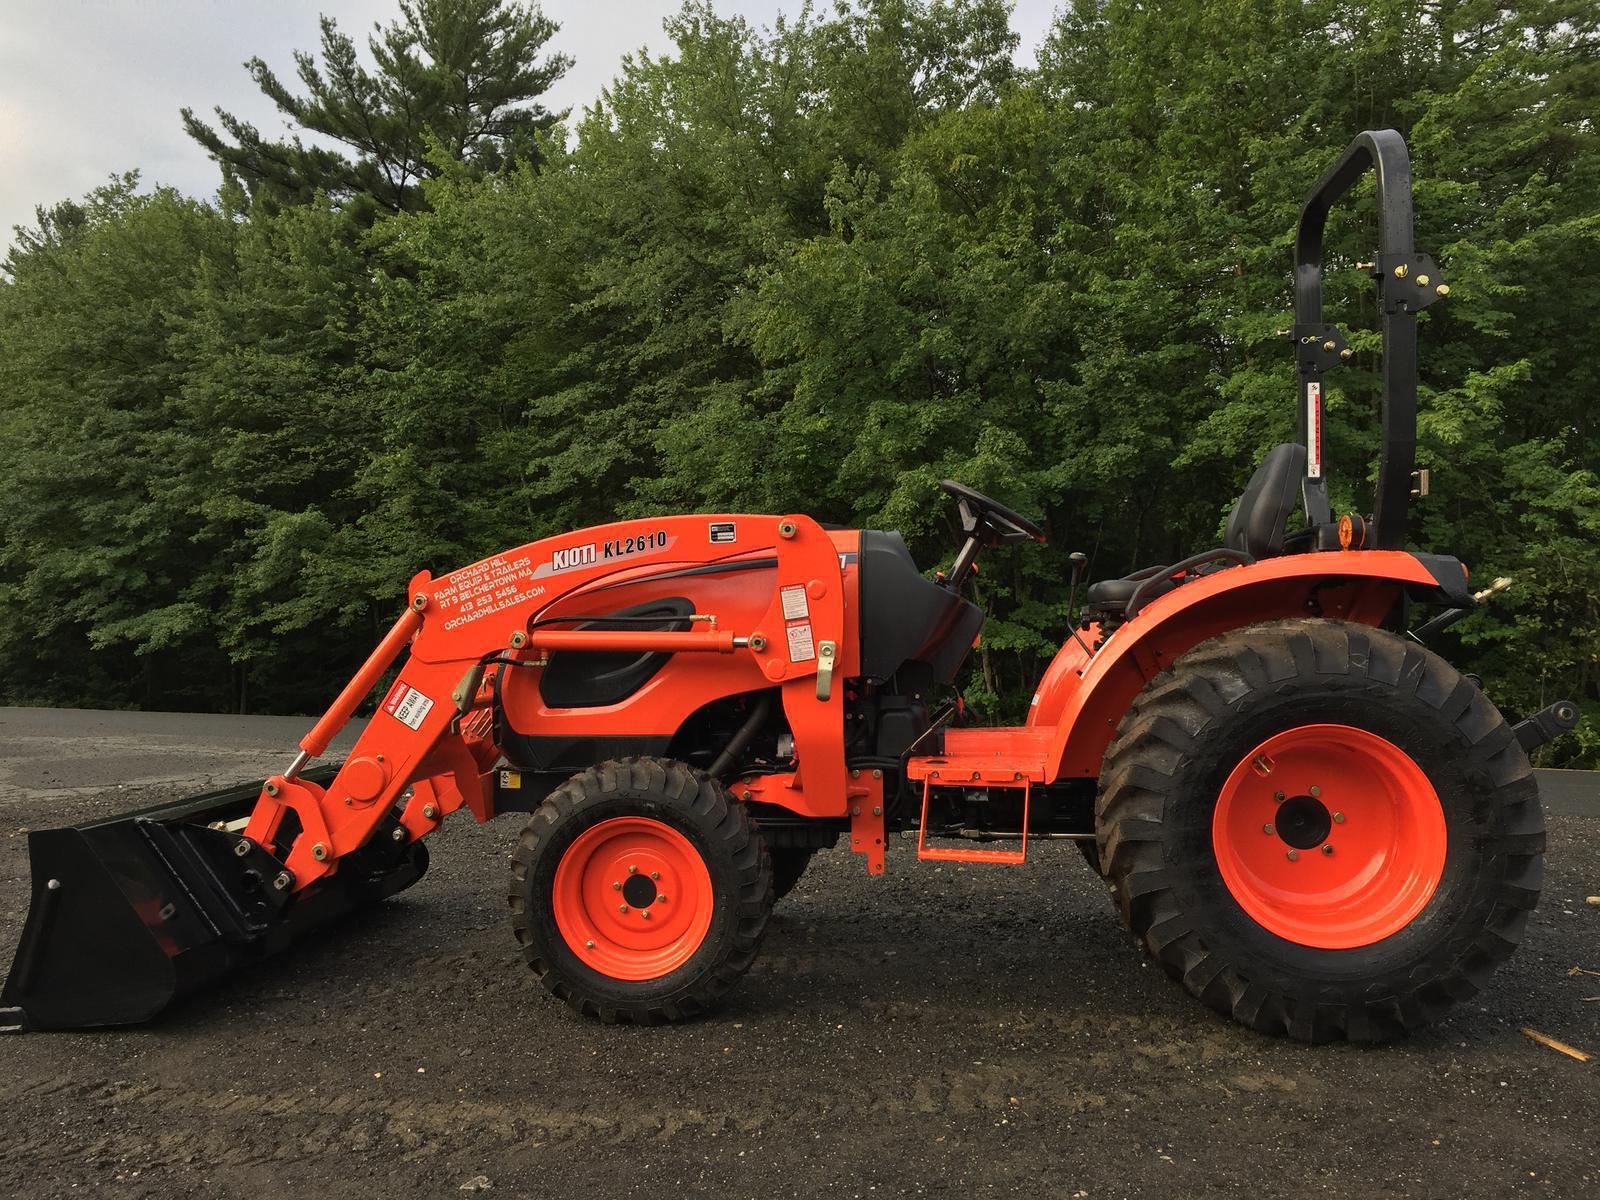 2018 kioti ck2610 manual hst 4wd tractor loader for sale in rh orchardhillsales net kioti tractor manuals free ds4110 kioti tractor manual online